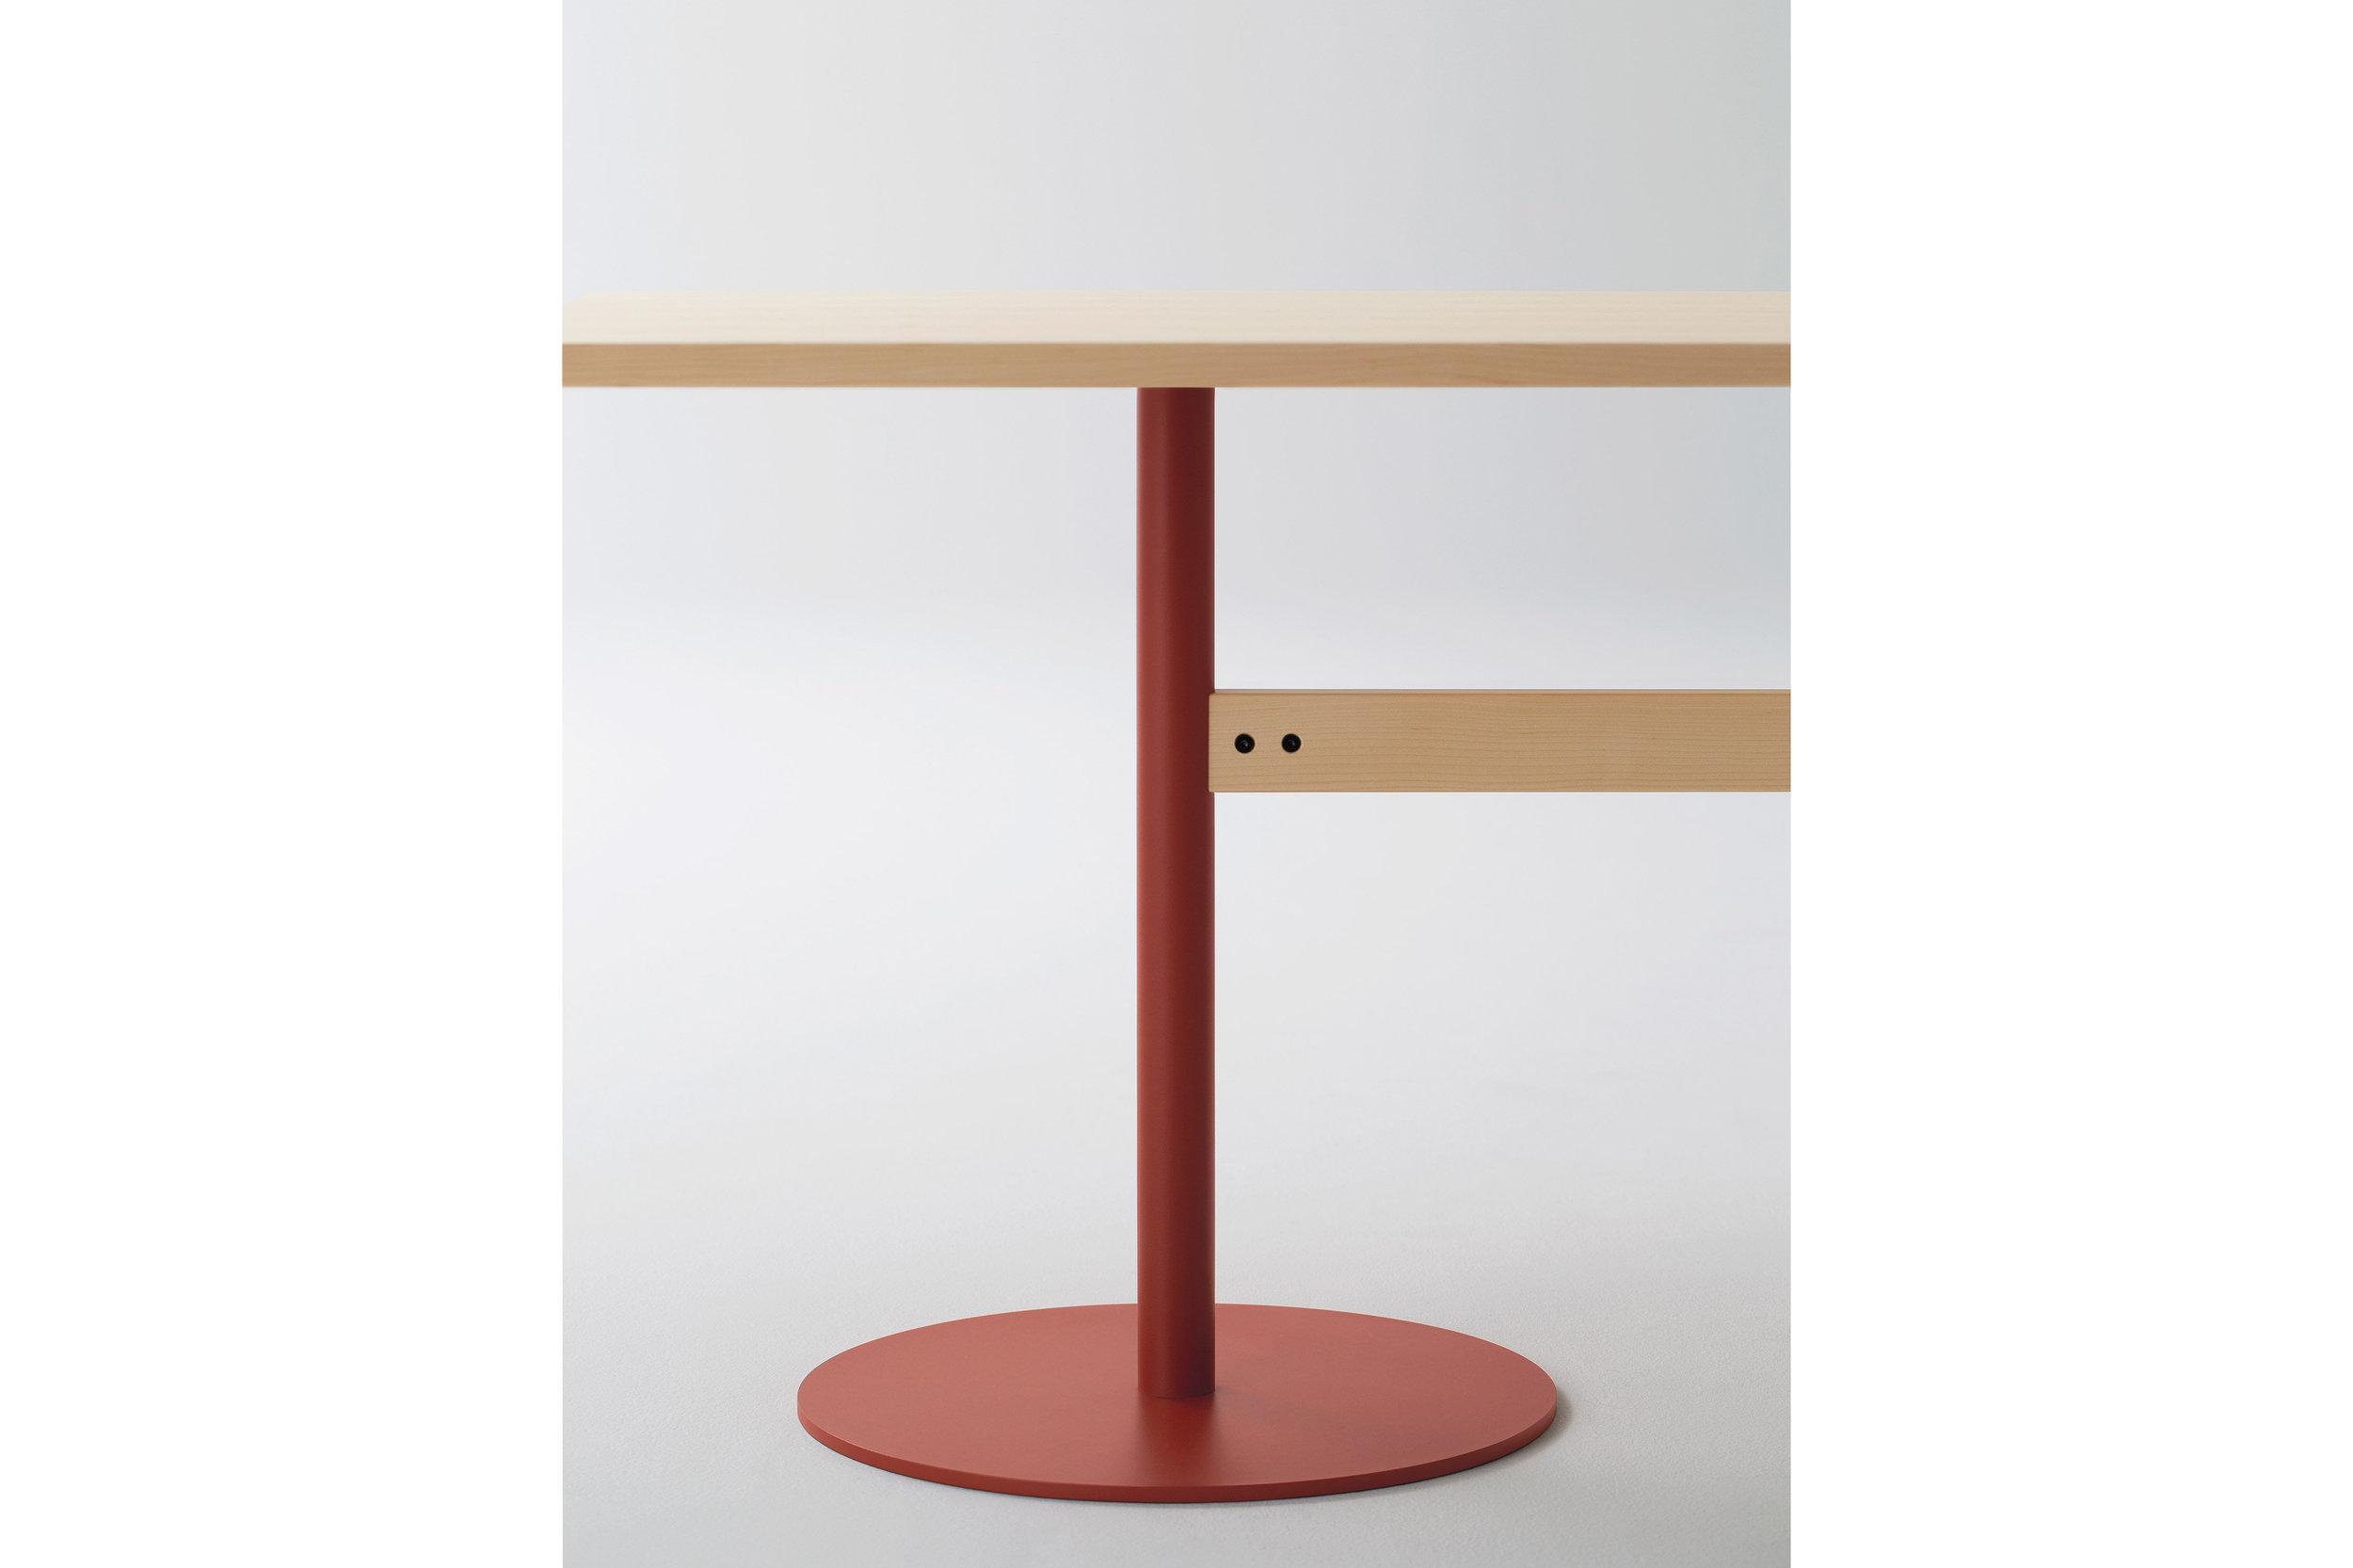 t-o-tables-jasper-morrison-maruni-design-furniture-_dezeen_2364_col_1.jpg